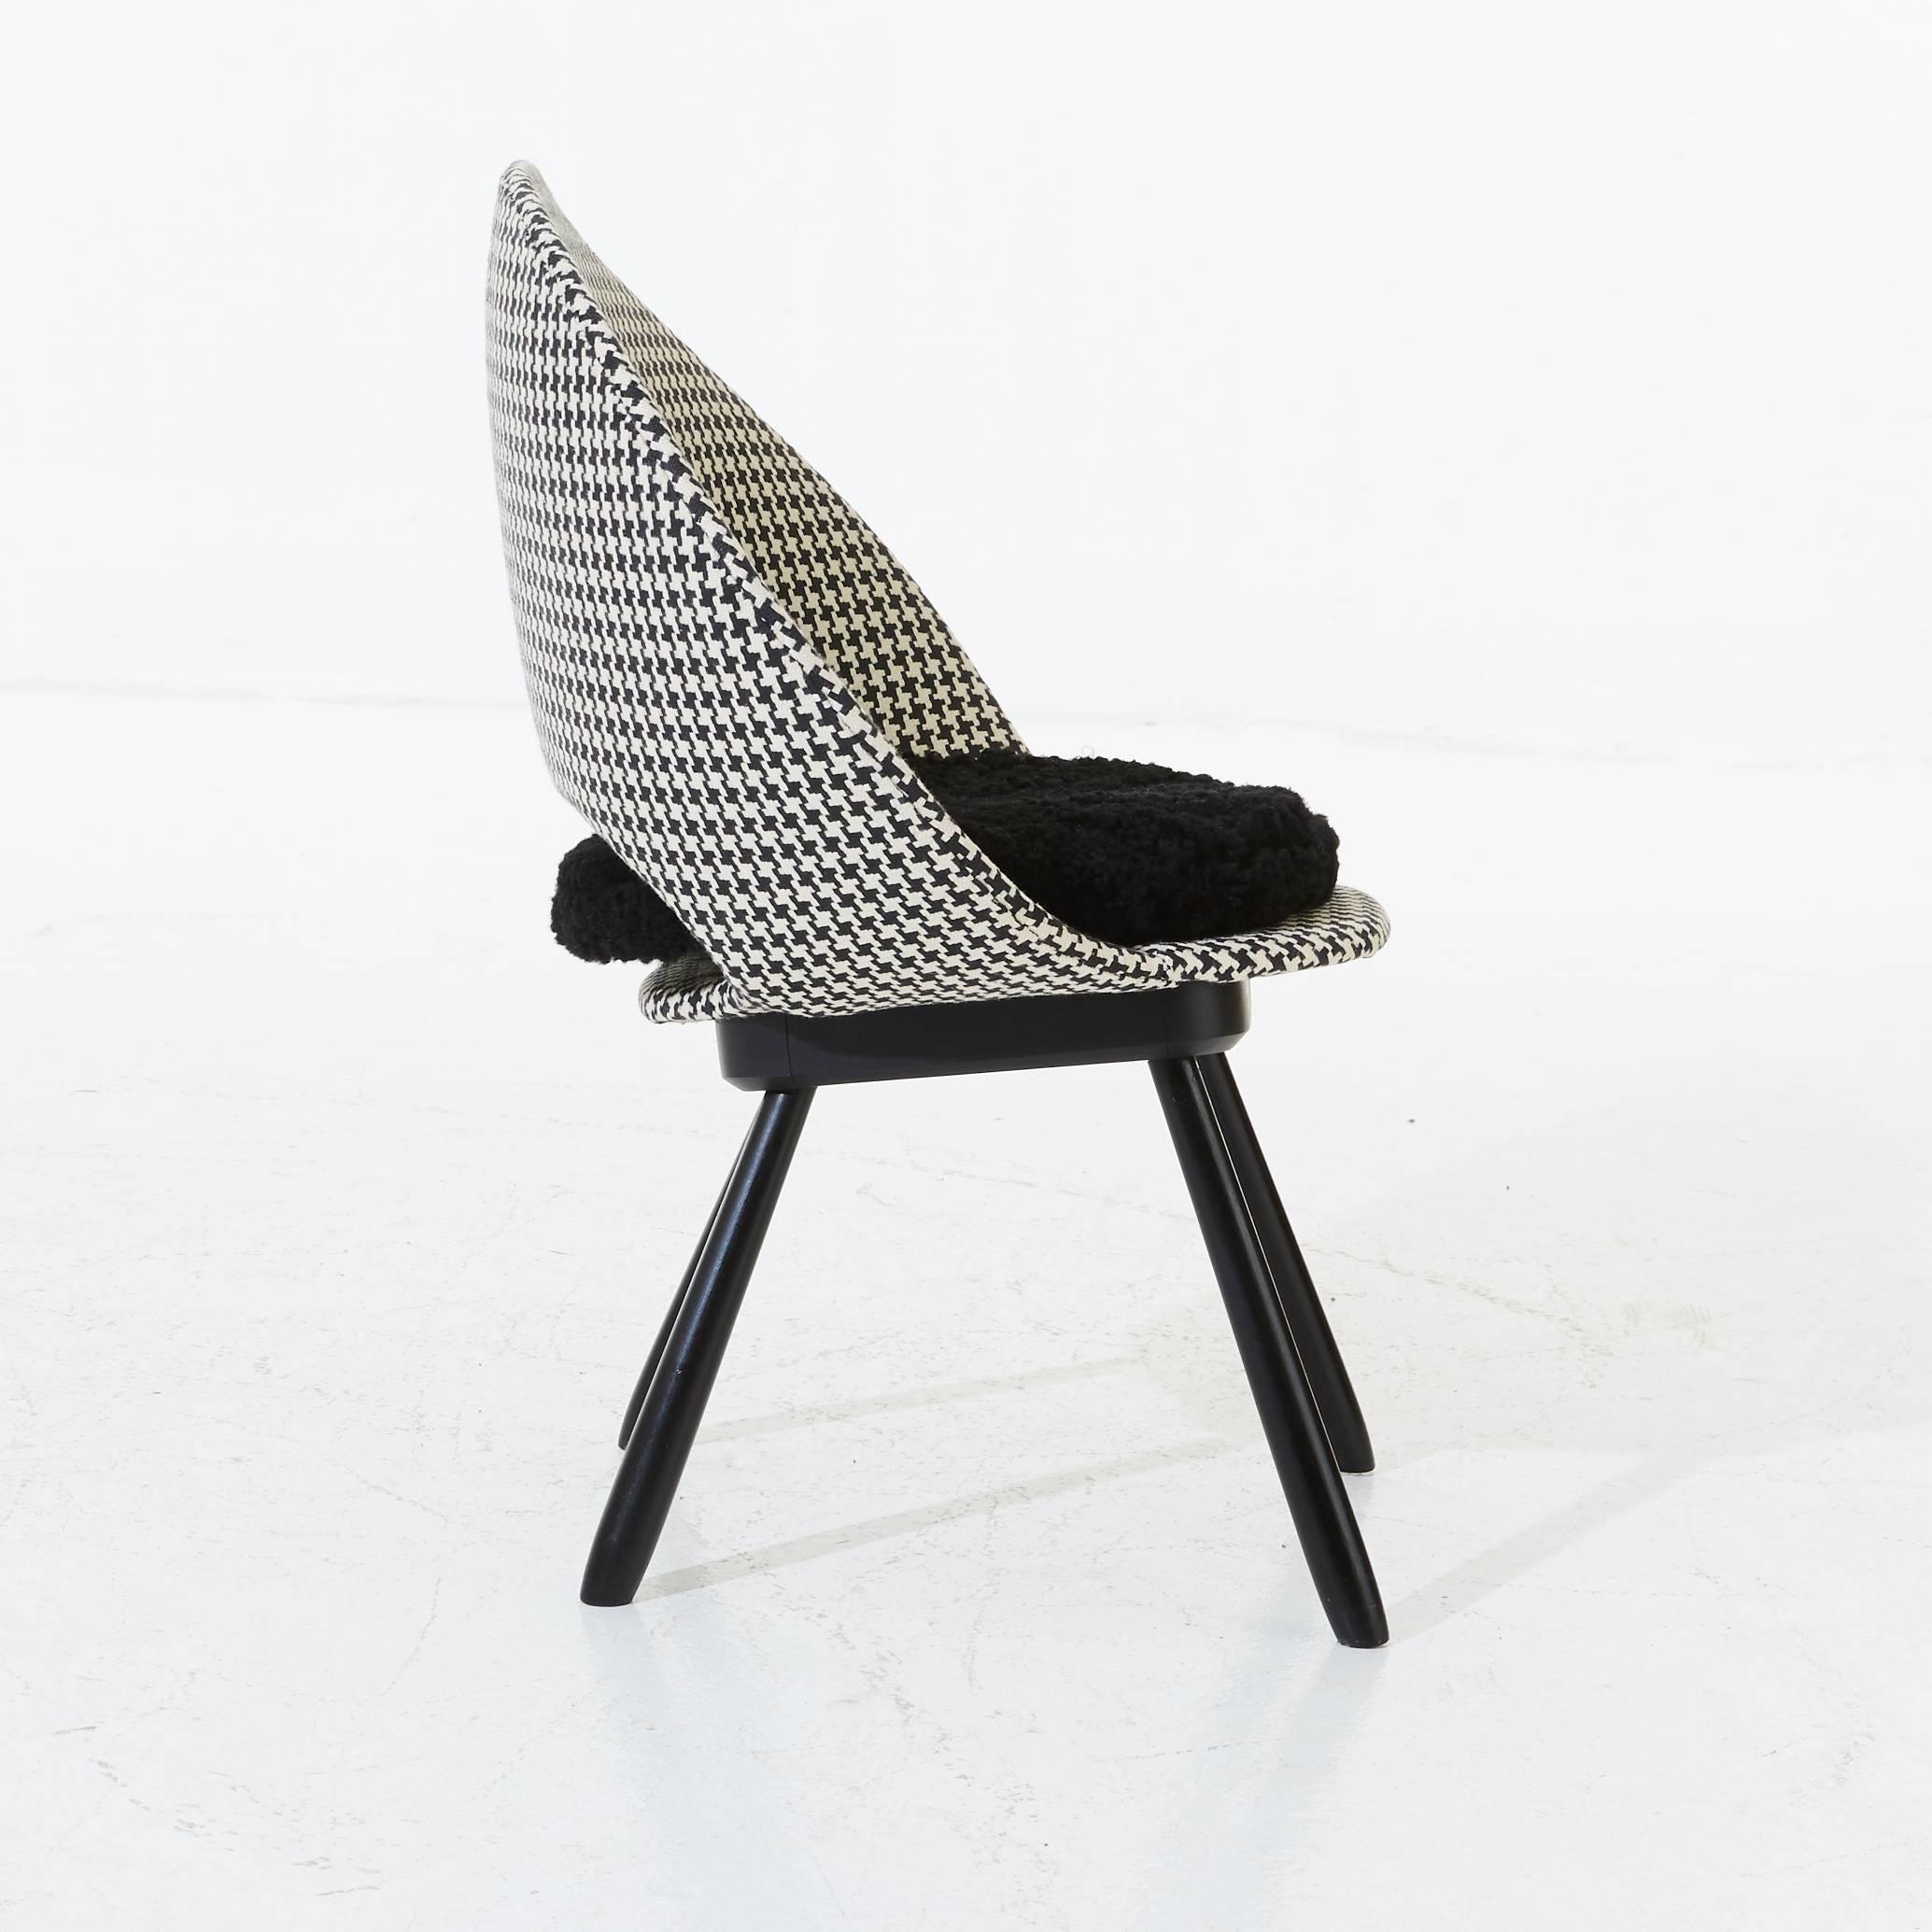 Beau Scandinavian Modern Swedish Chair, 1950s, Houndstooth Pattern With  Sheepskin Seat For Sale